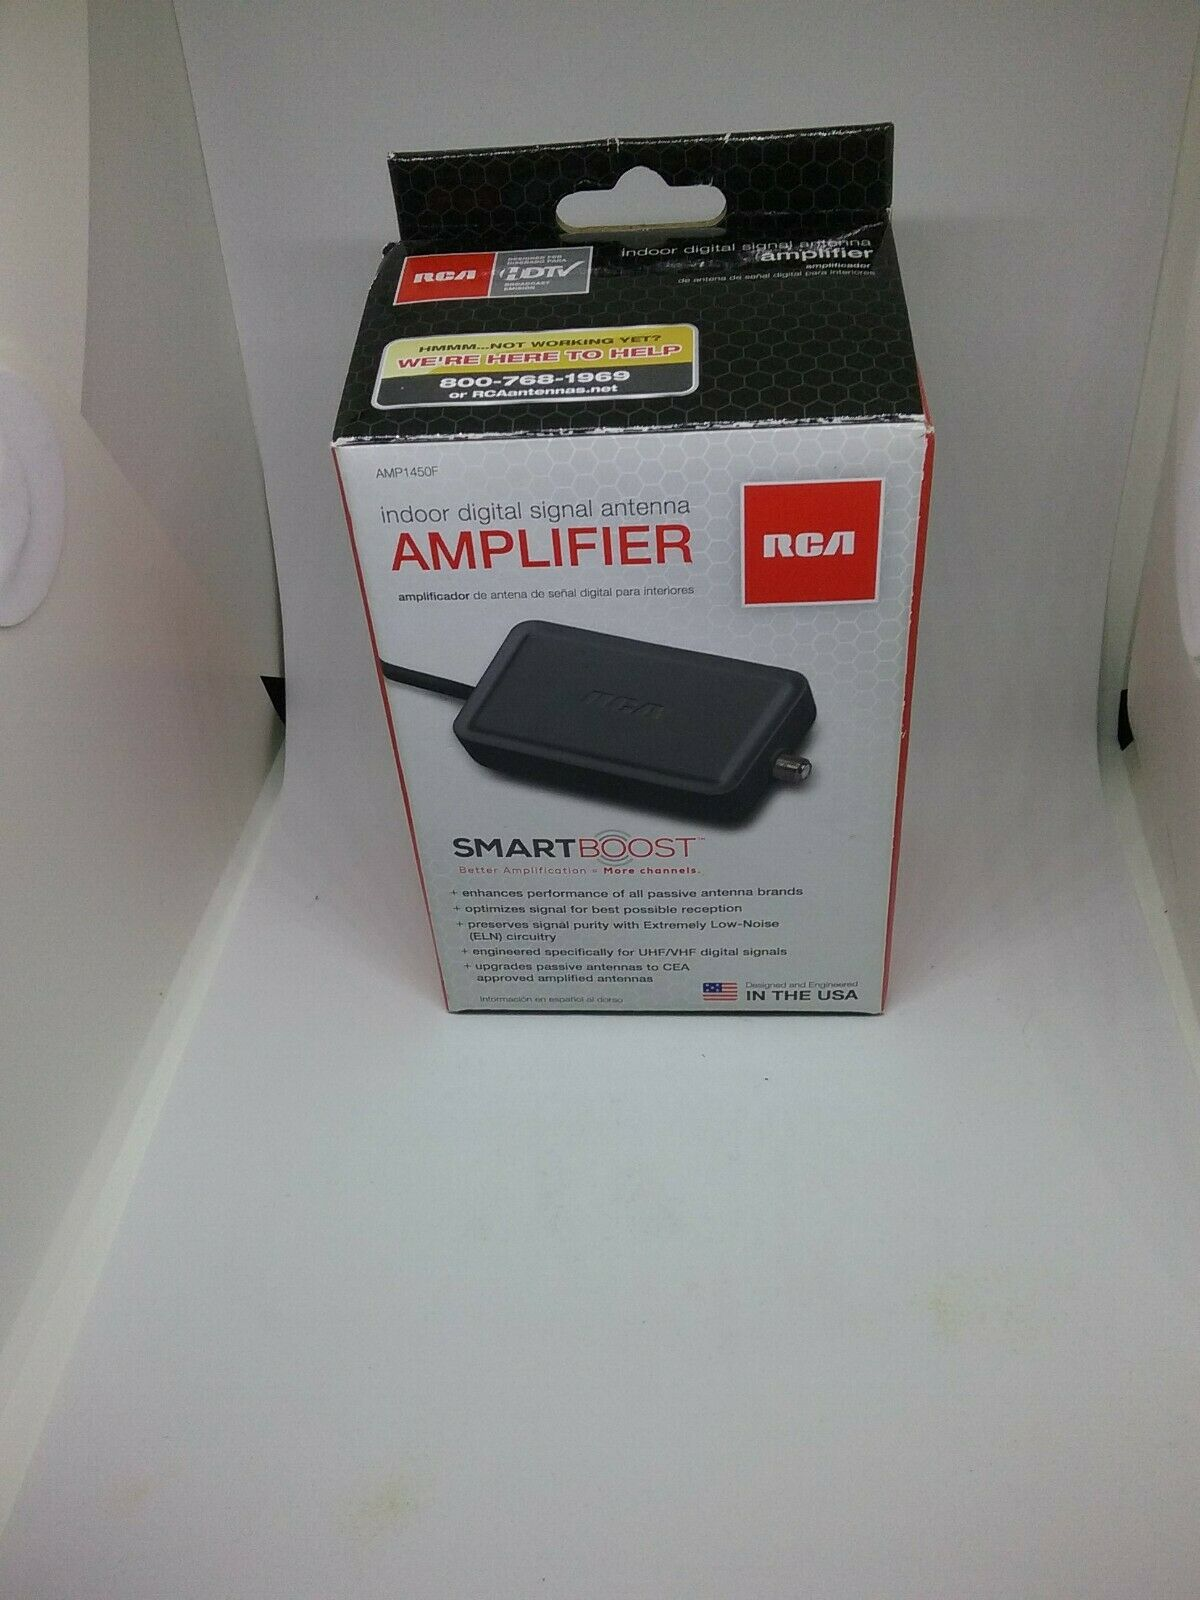 RCA Digital Amplifier for Indoor HDTV Antennas AMP1450Z